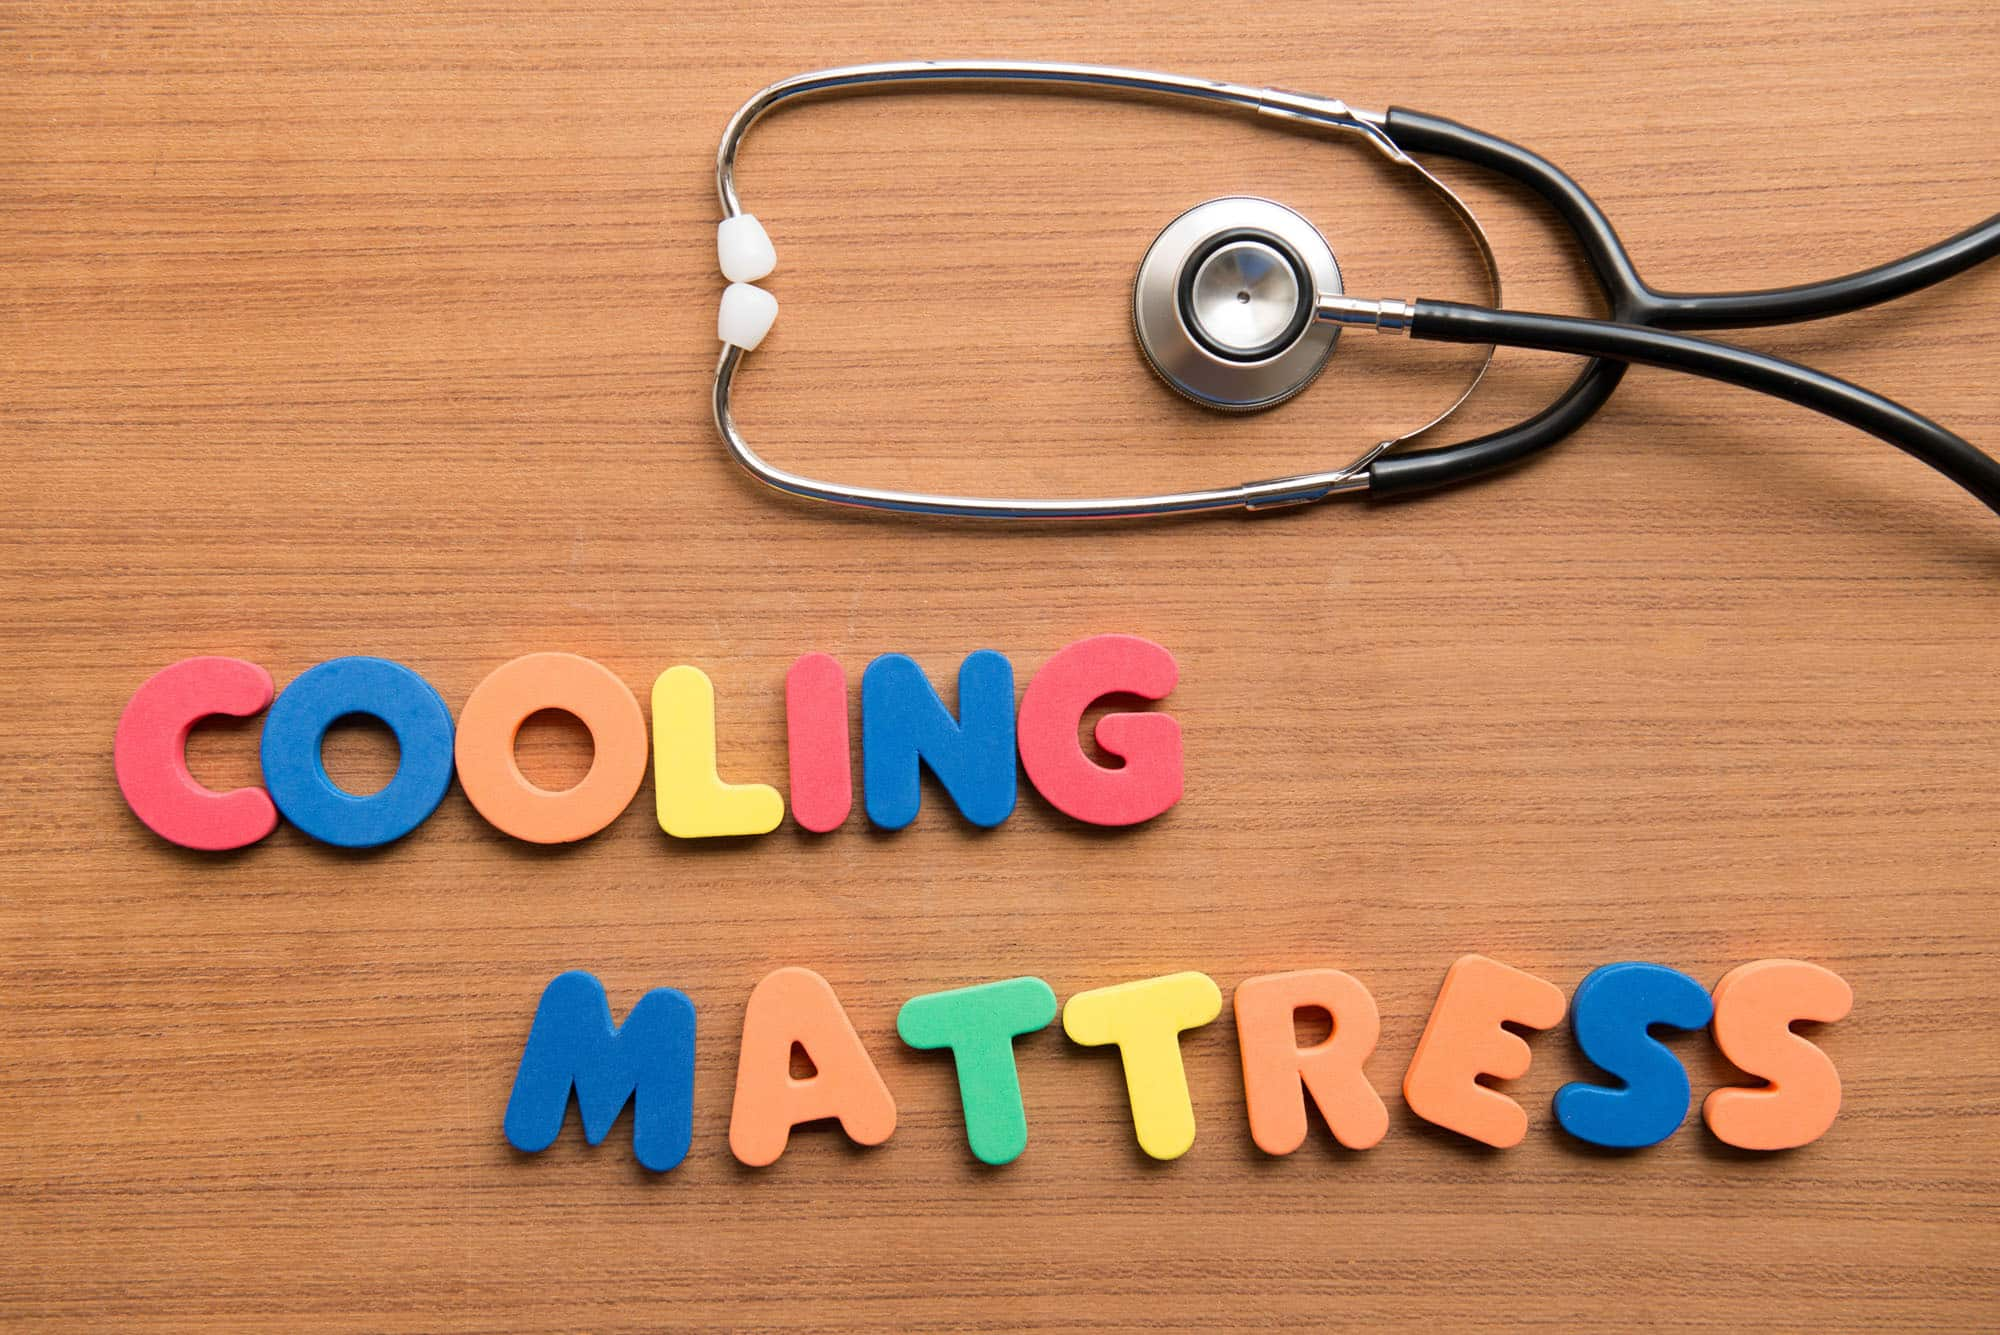 Best Cooling Mattress Reviews For Hot Sleepers 2020 Update